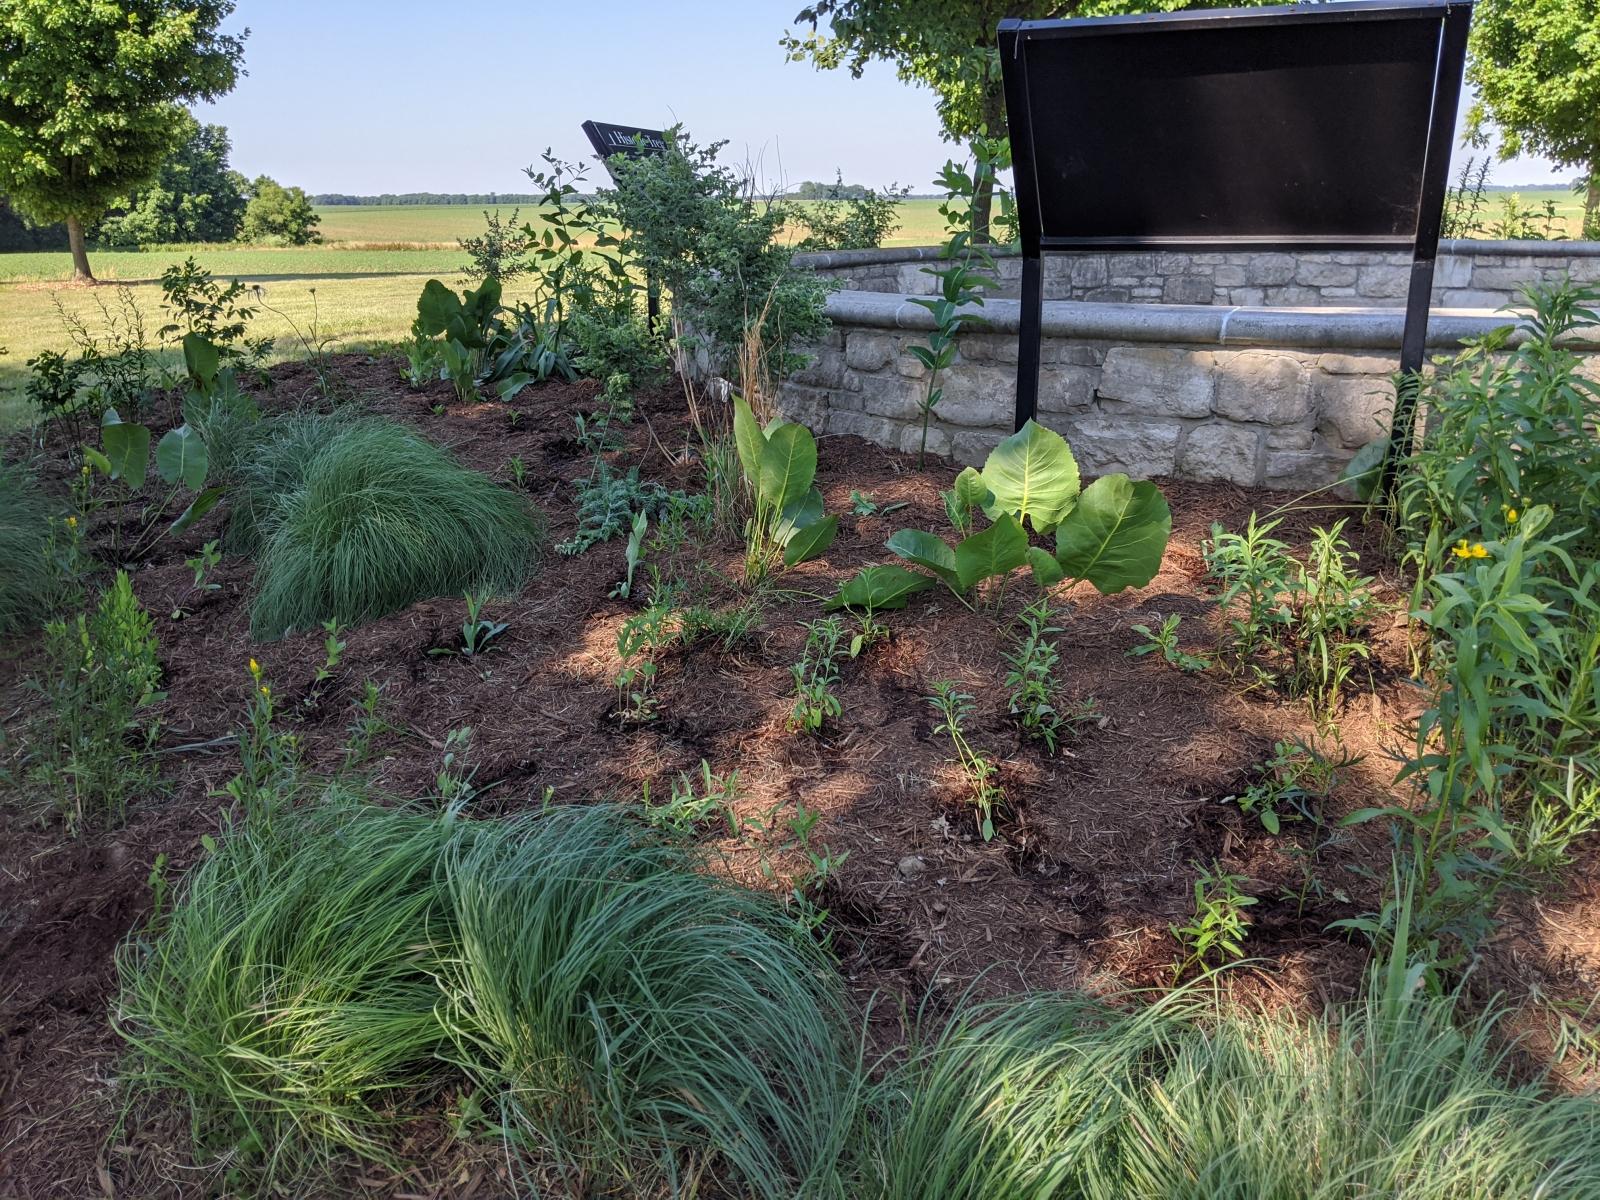 Wayside Pollinator Waystation Planting, June 12